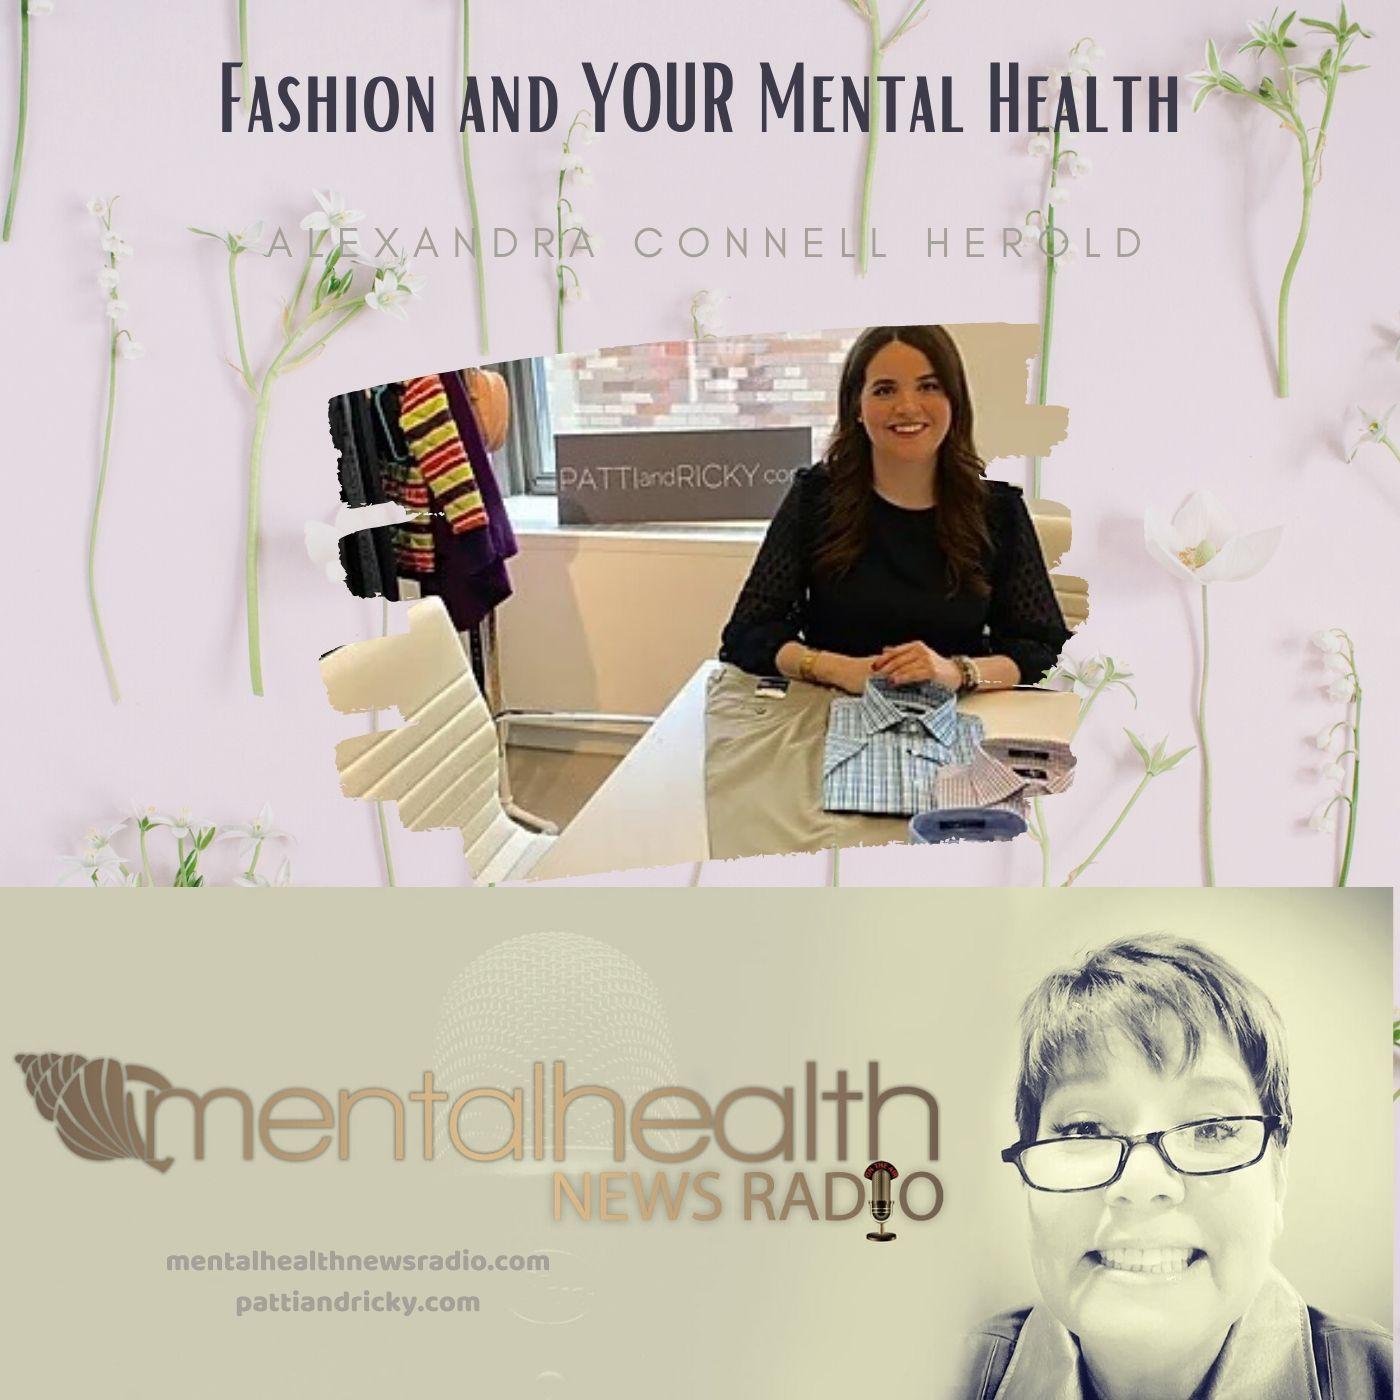 Mental Health News Radio - Fashion and YOUR Mental Health